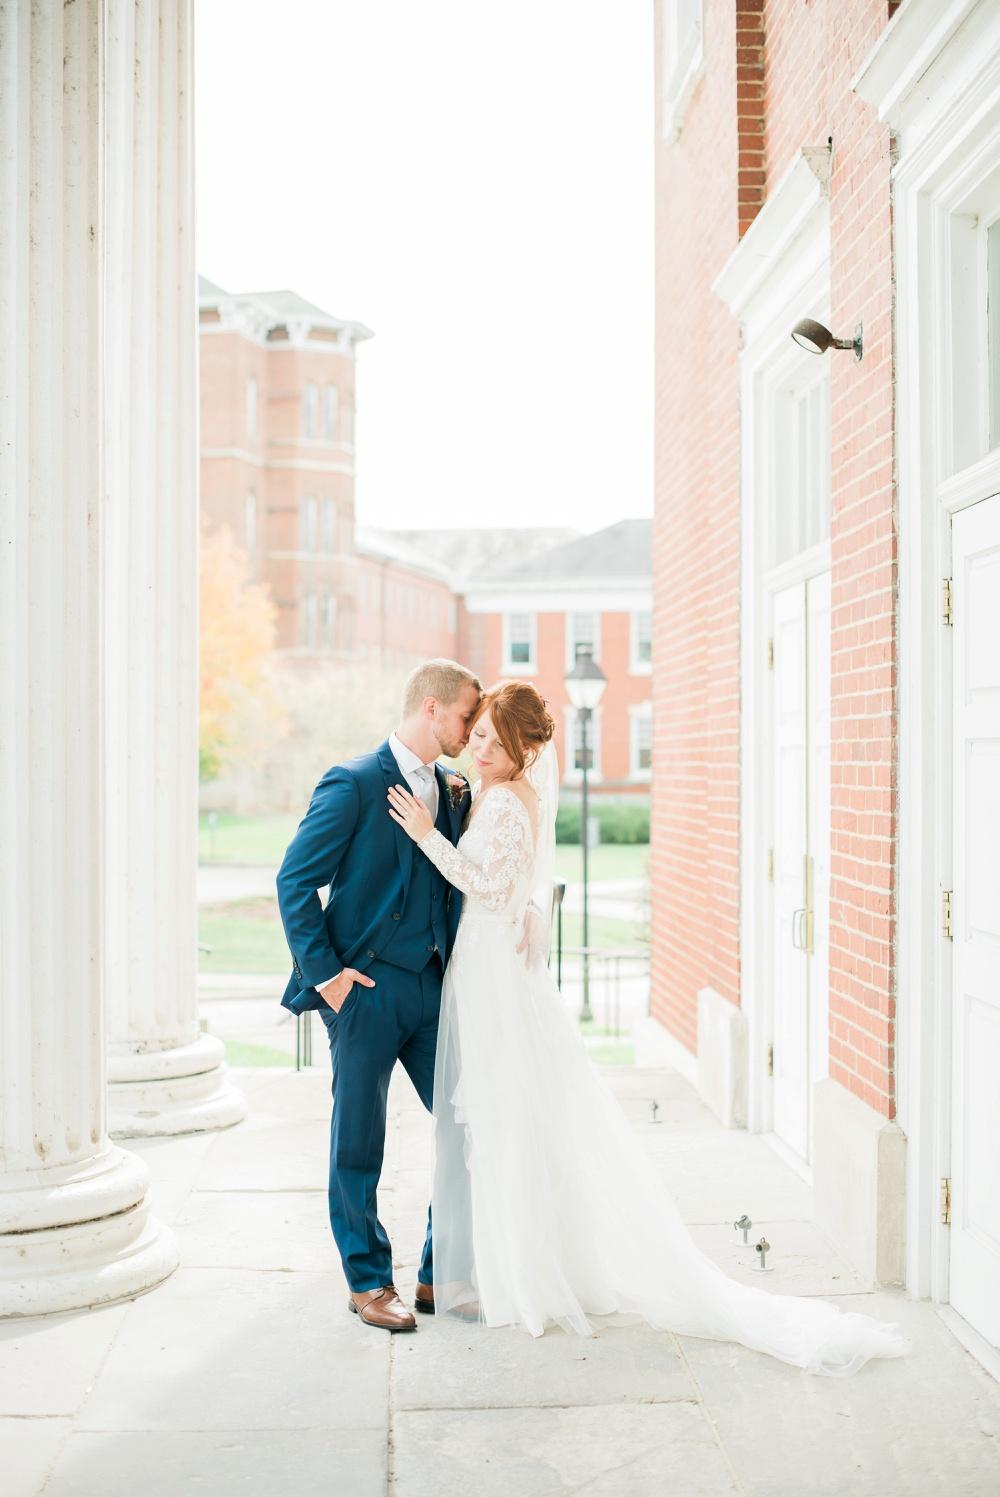 ohio-university-walter-hall-wedding-athens-anna-mark_0058.jpg